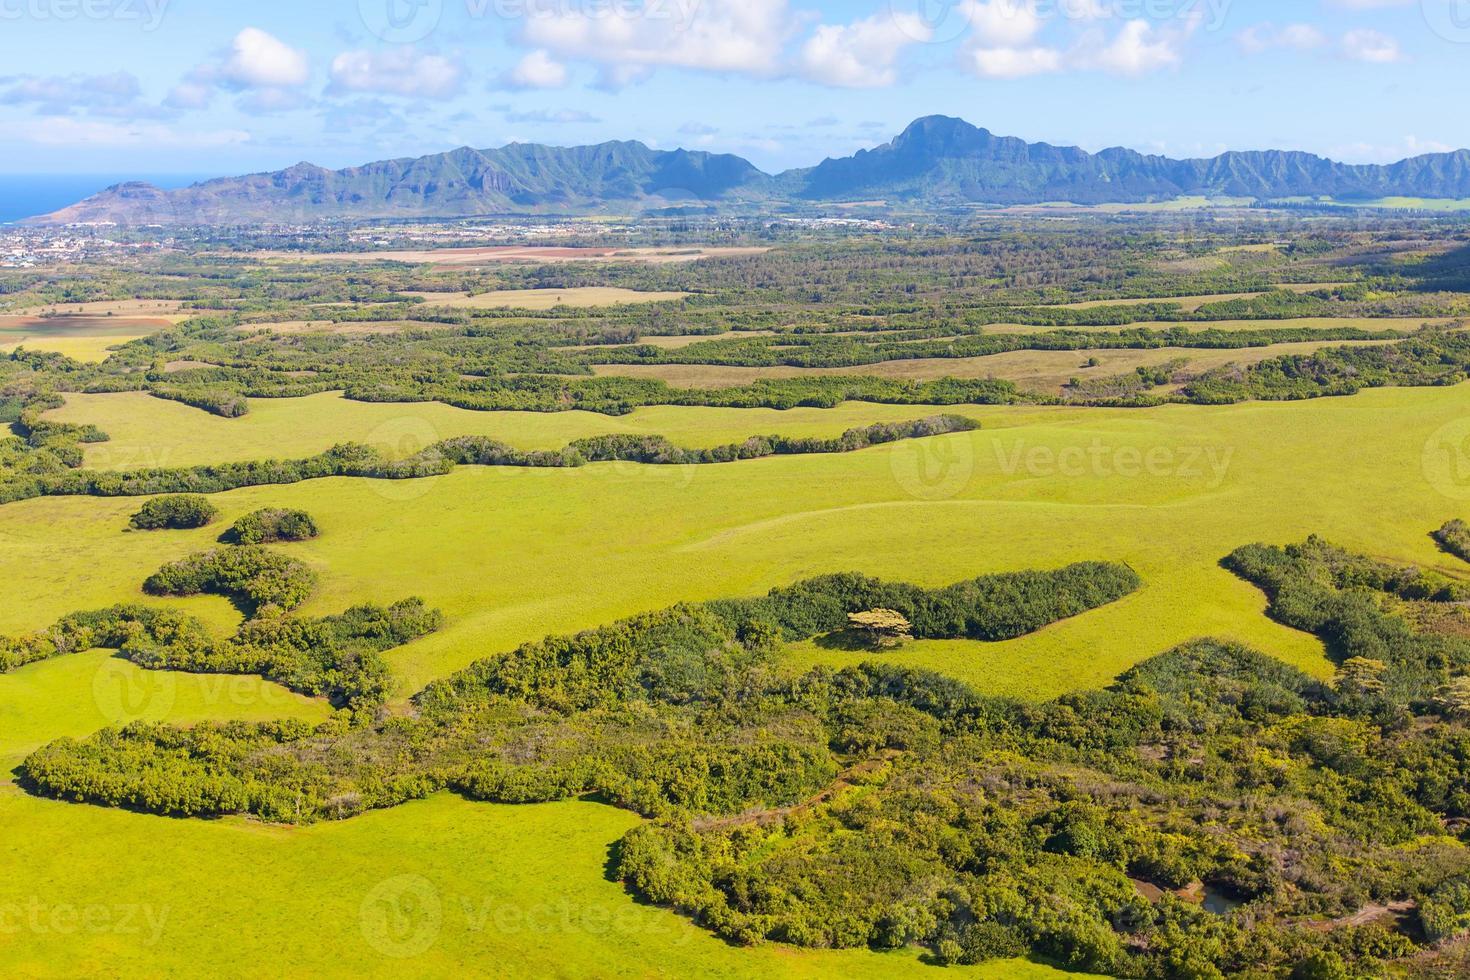 kauai uitzicht vanuit helikopter foto